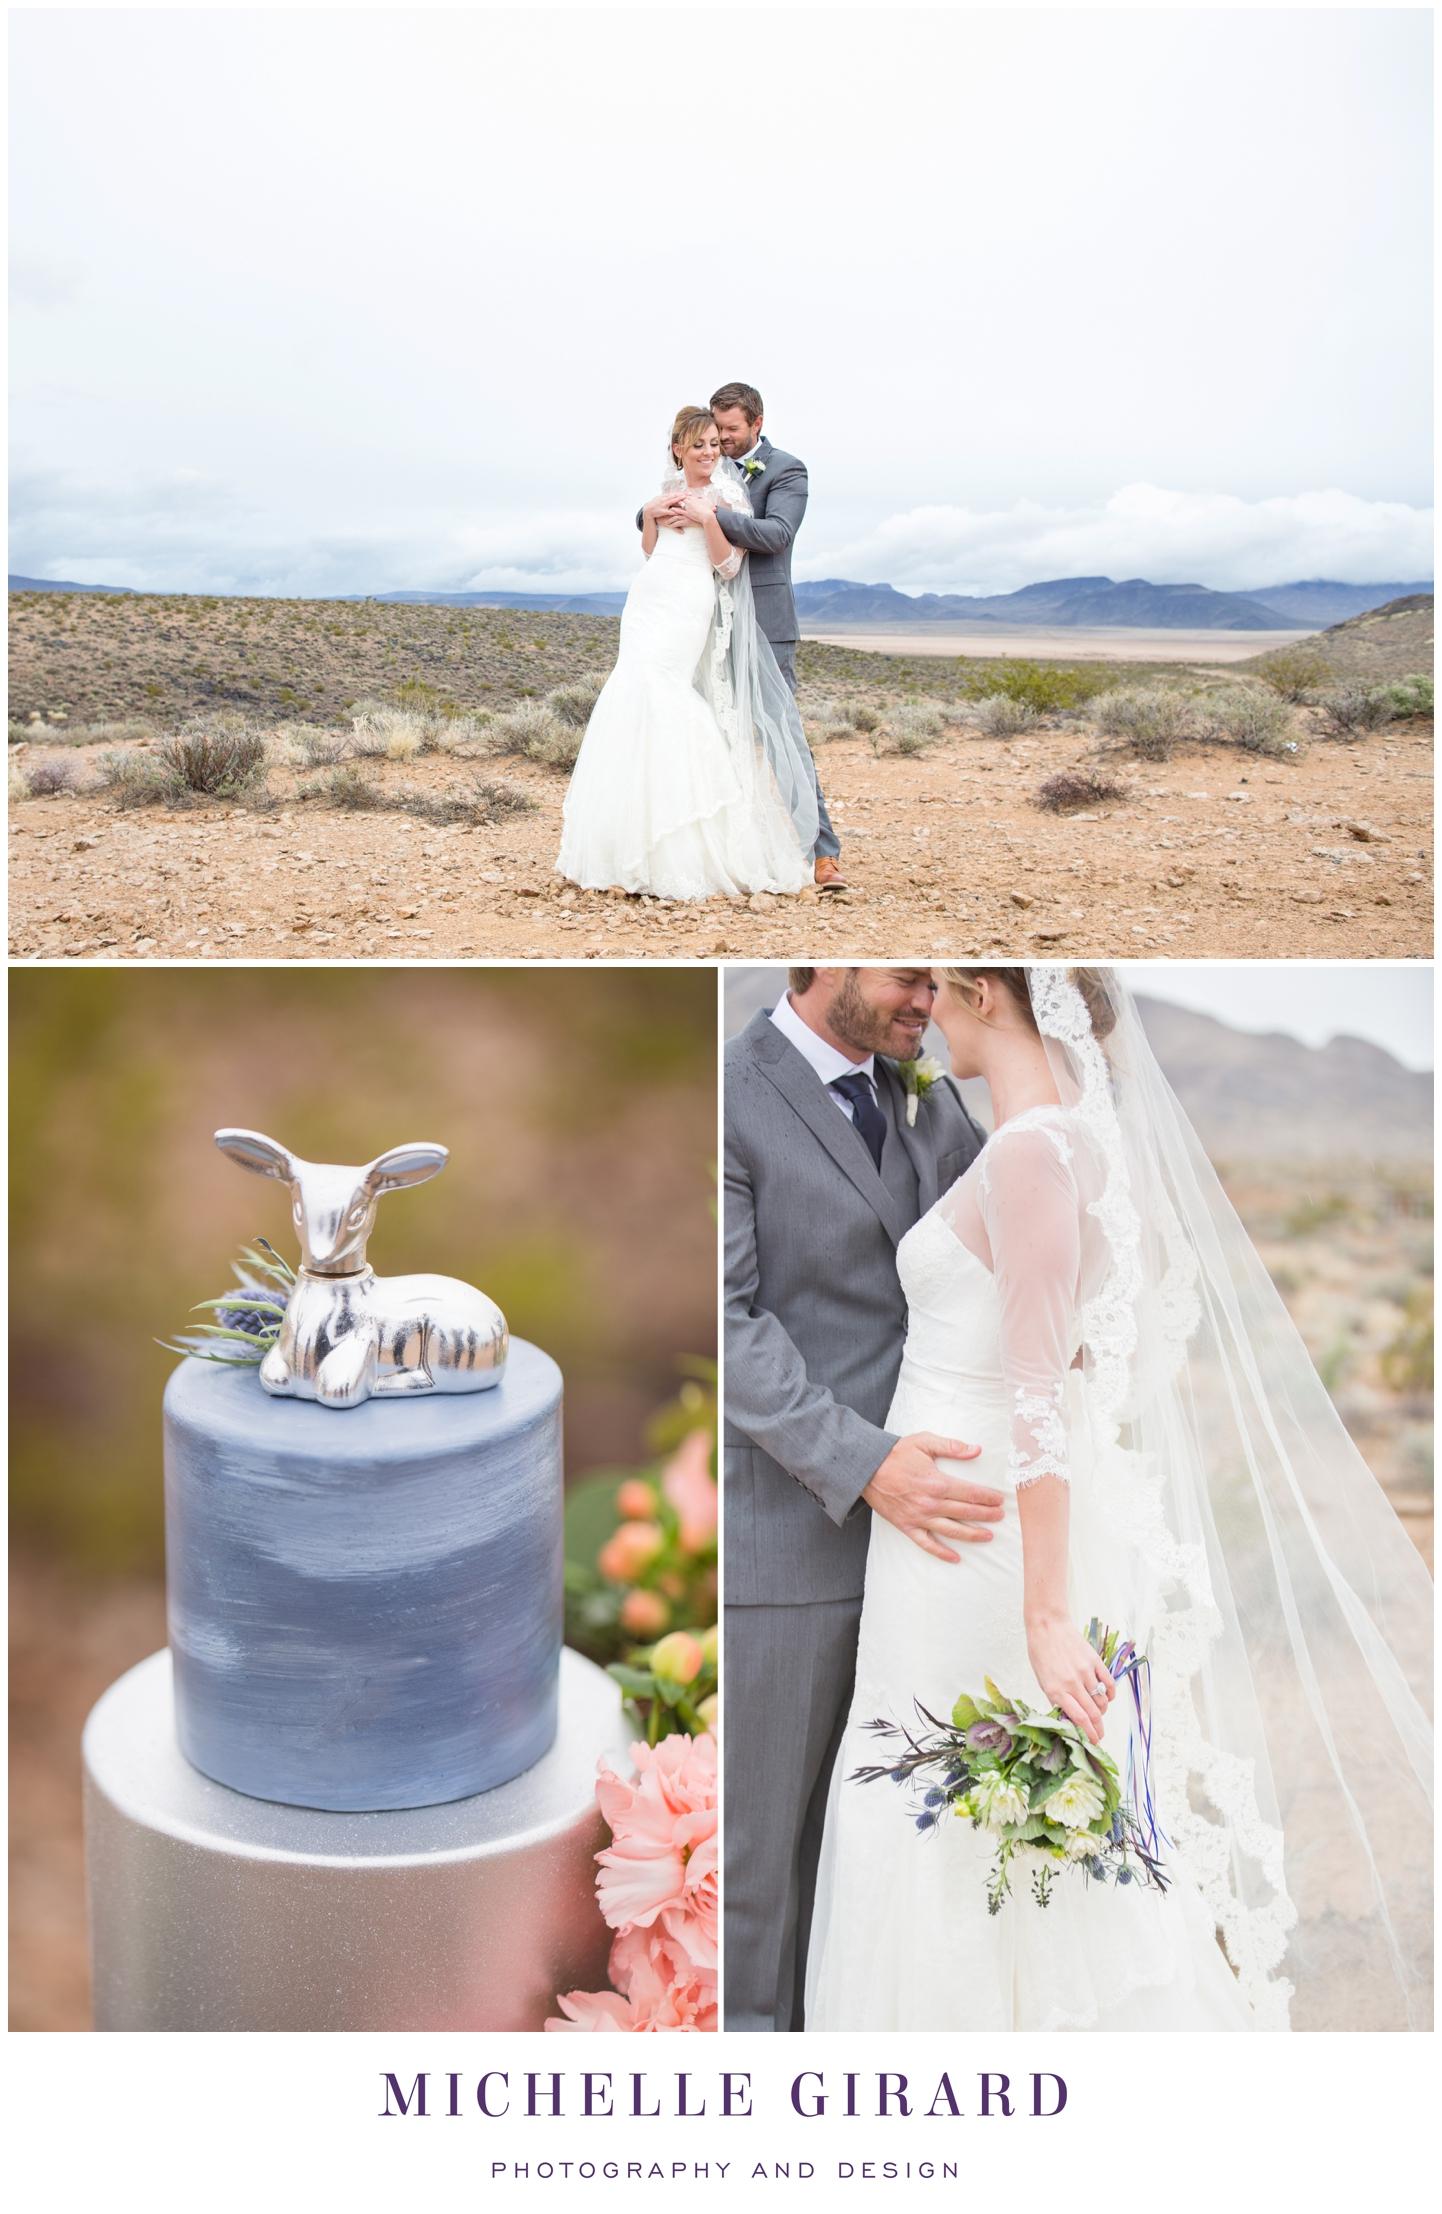 nevada-desert-lace-veil-michelle-girard-wedding-photography01.jpg